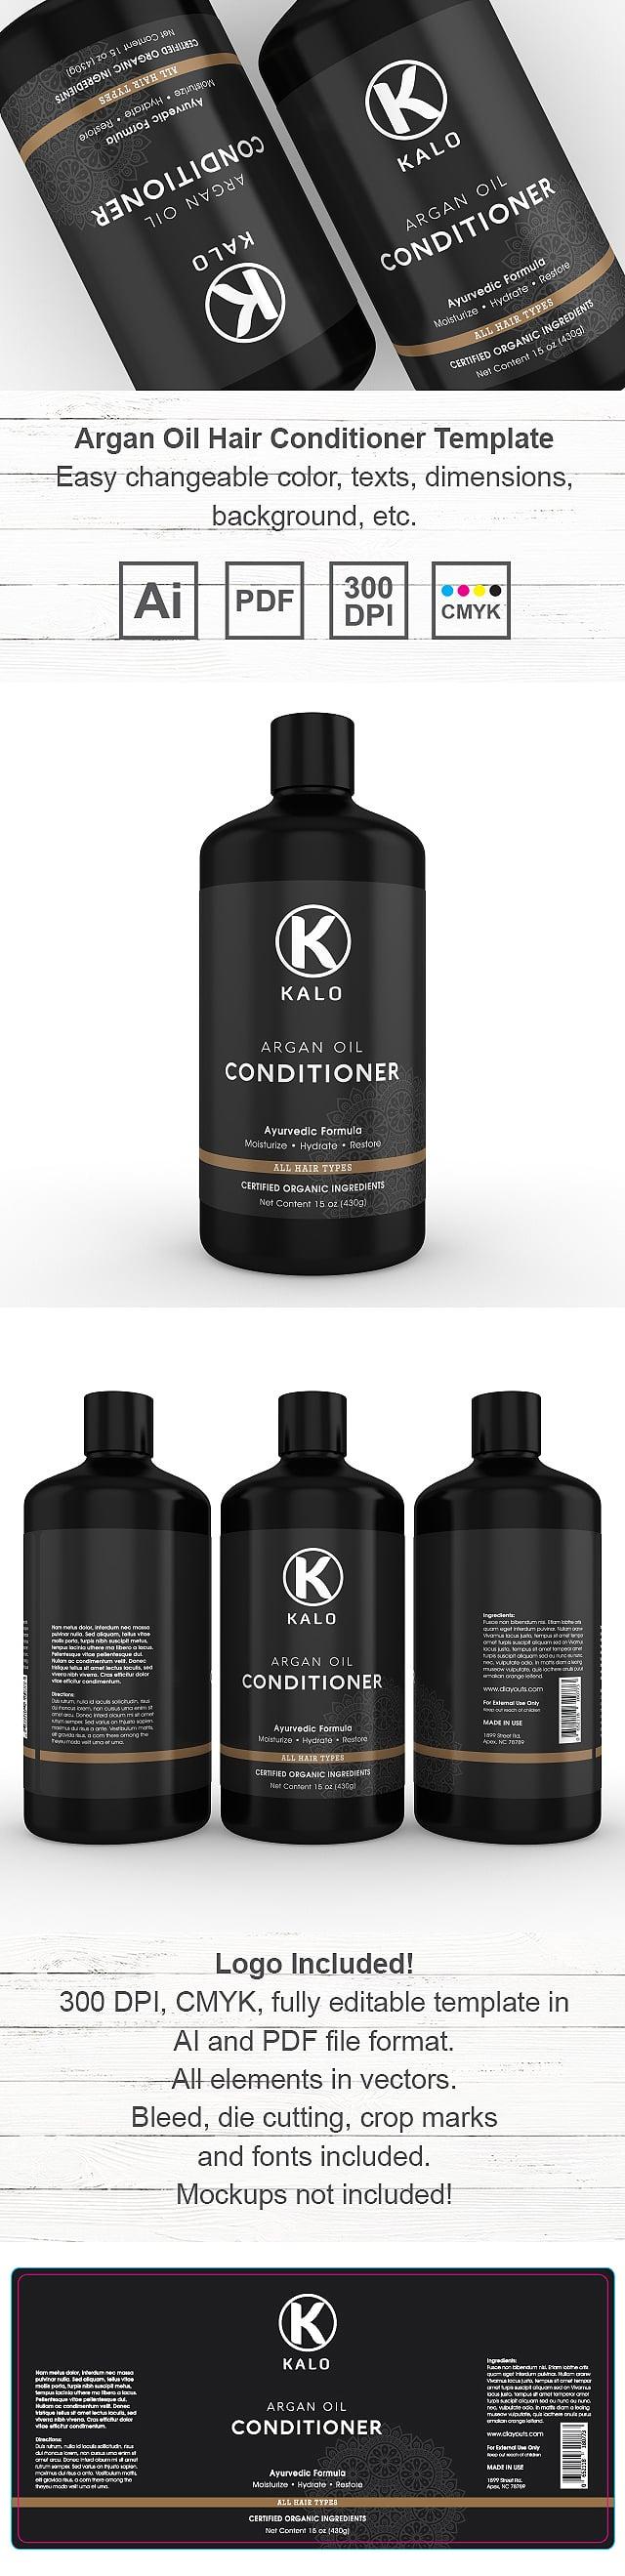 Argan Oil Hair Conditioner Label Template